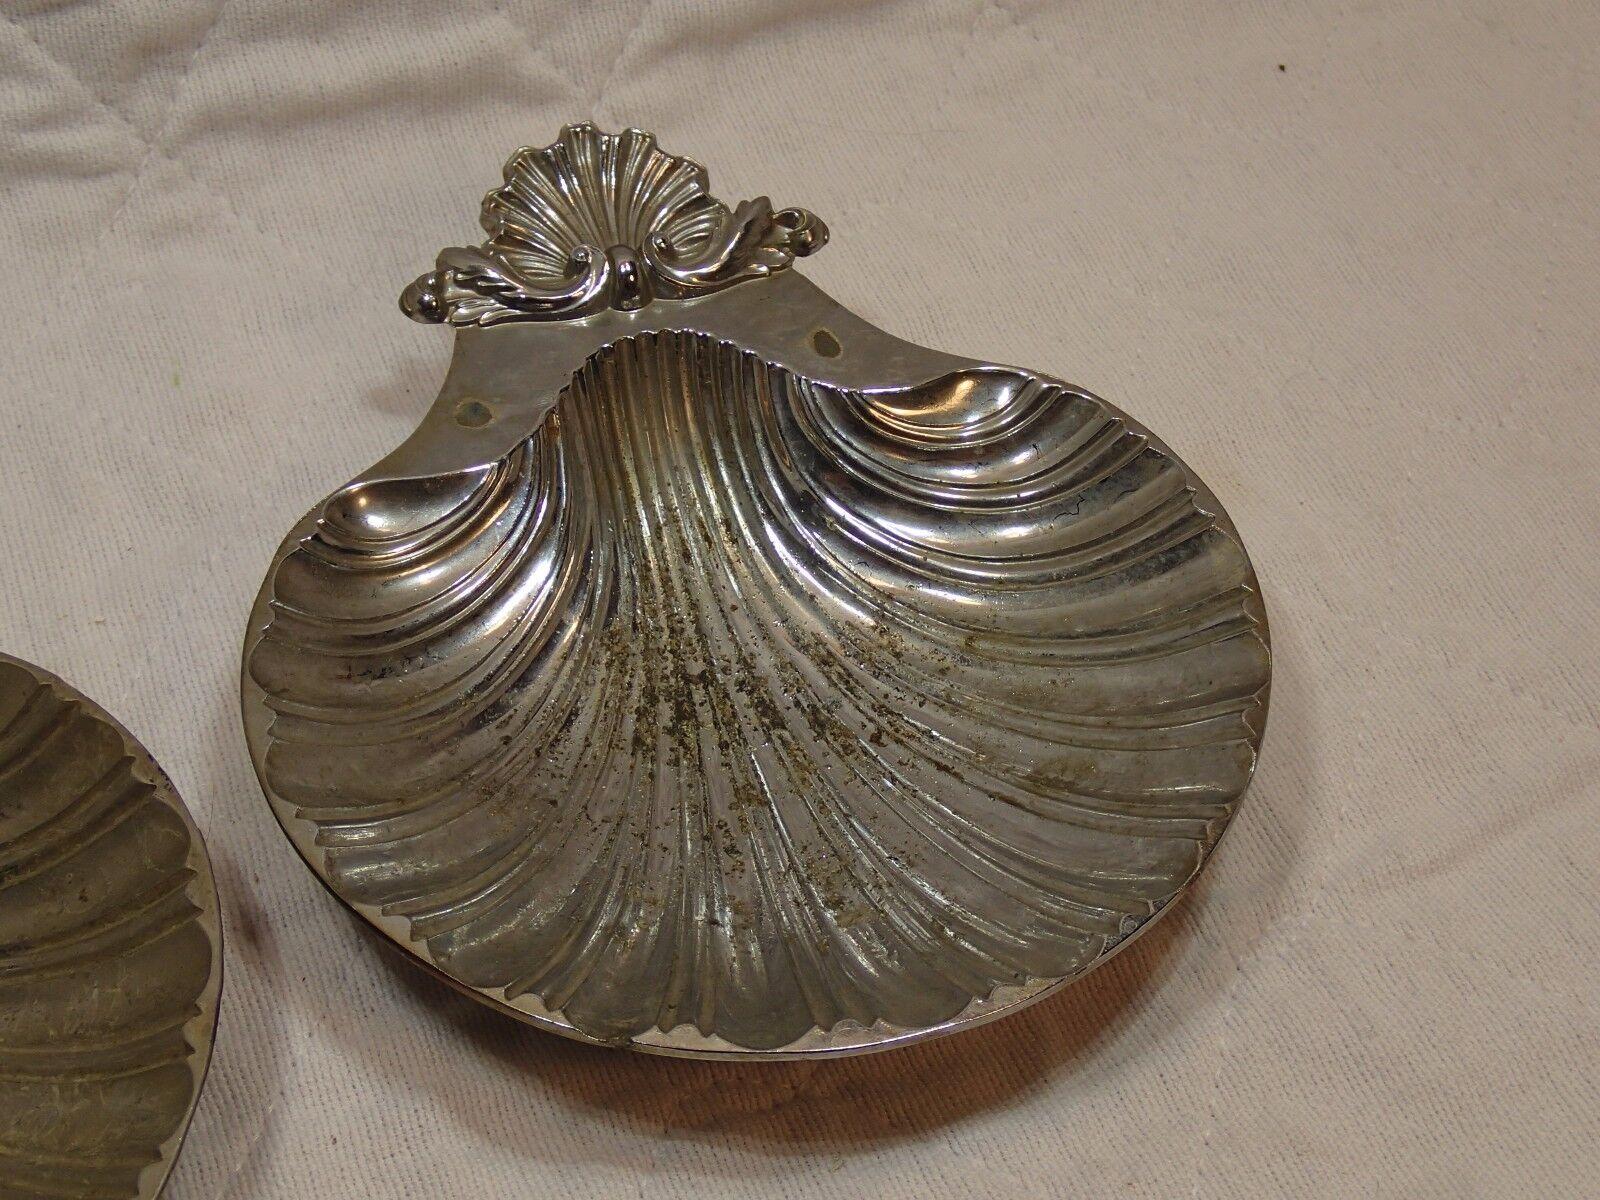 2 brass shell reproduction design sheffield england 1700 for Design reproduktion